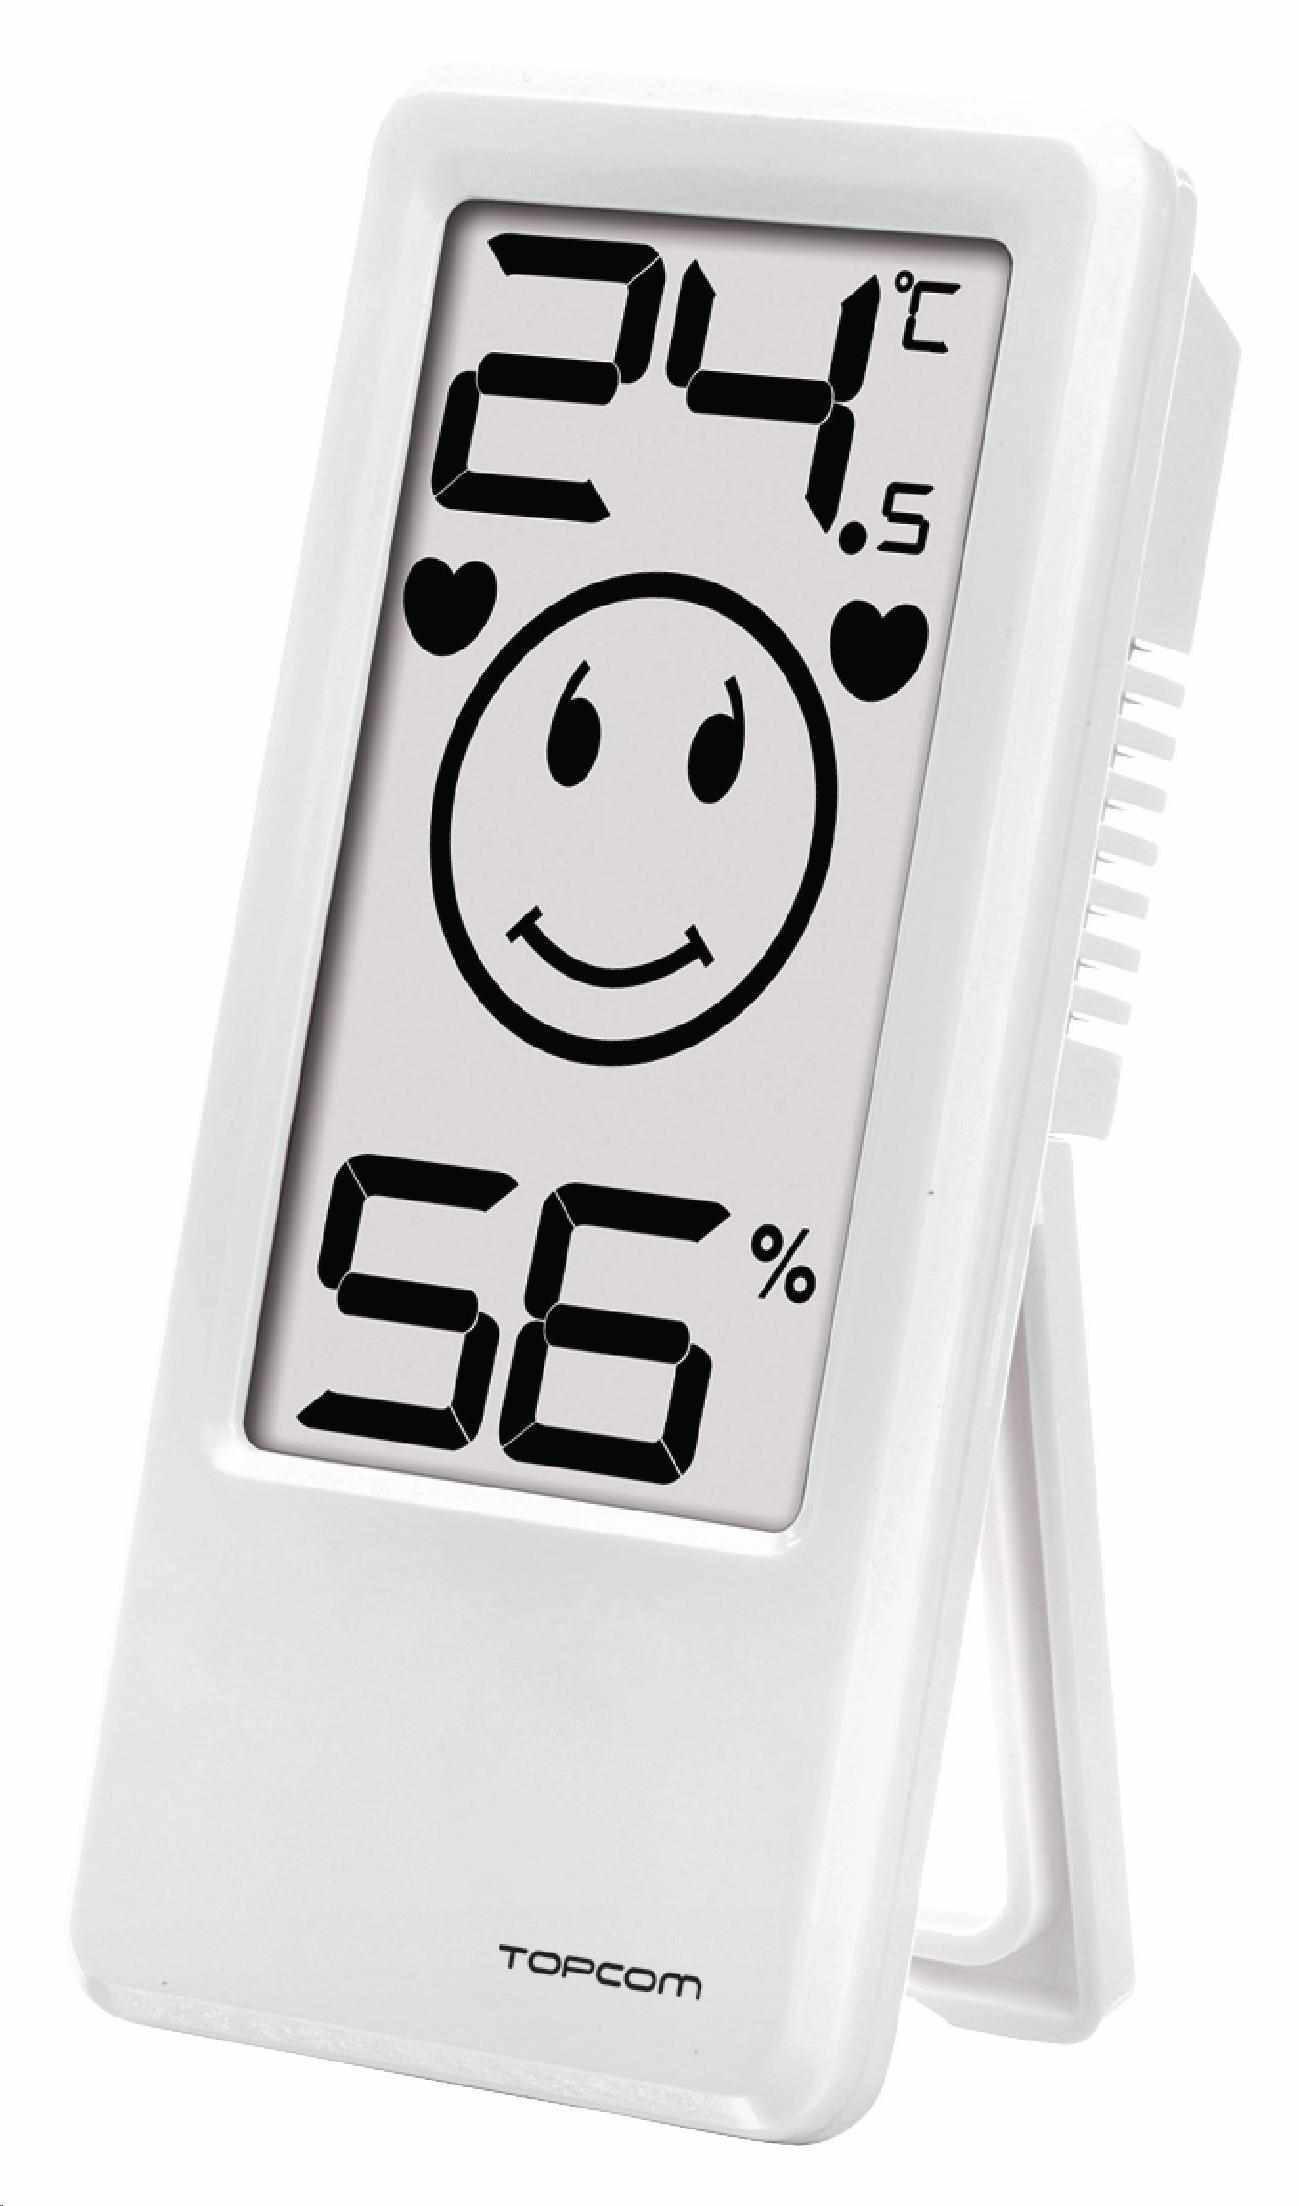 Topcom TH-4675 Baby Comfort Indicator 101-Digitálny pokojový teploměr/vlhkoměr